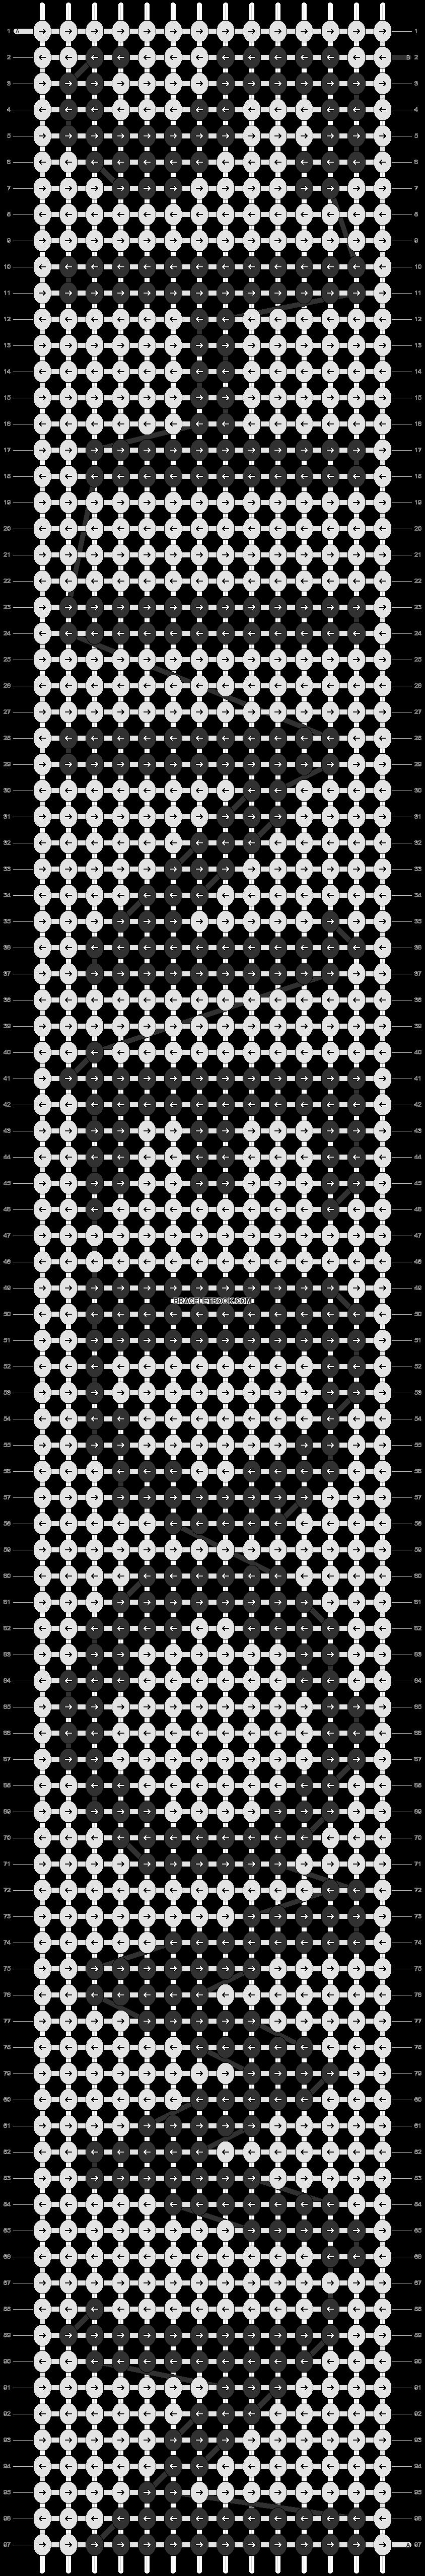 Alpha pattern #10398 pattern